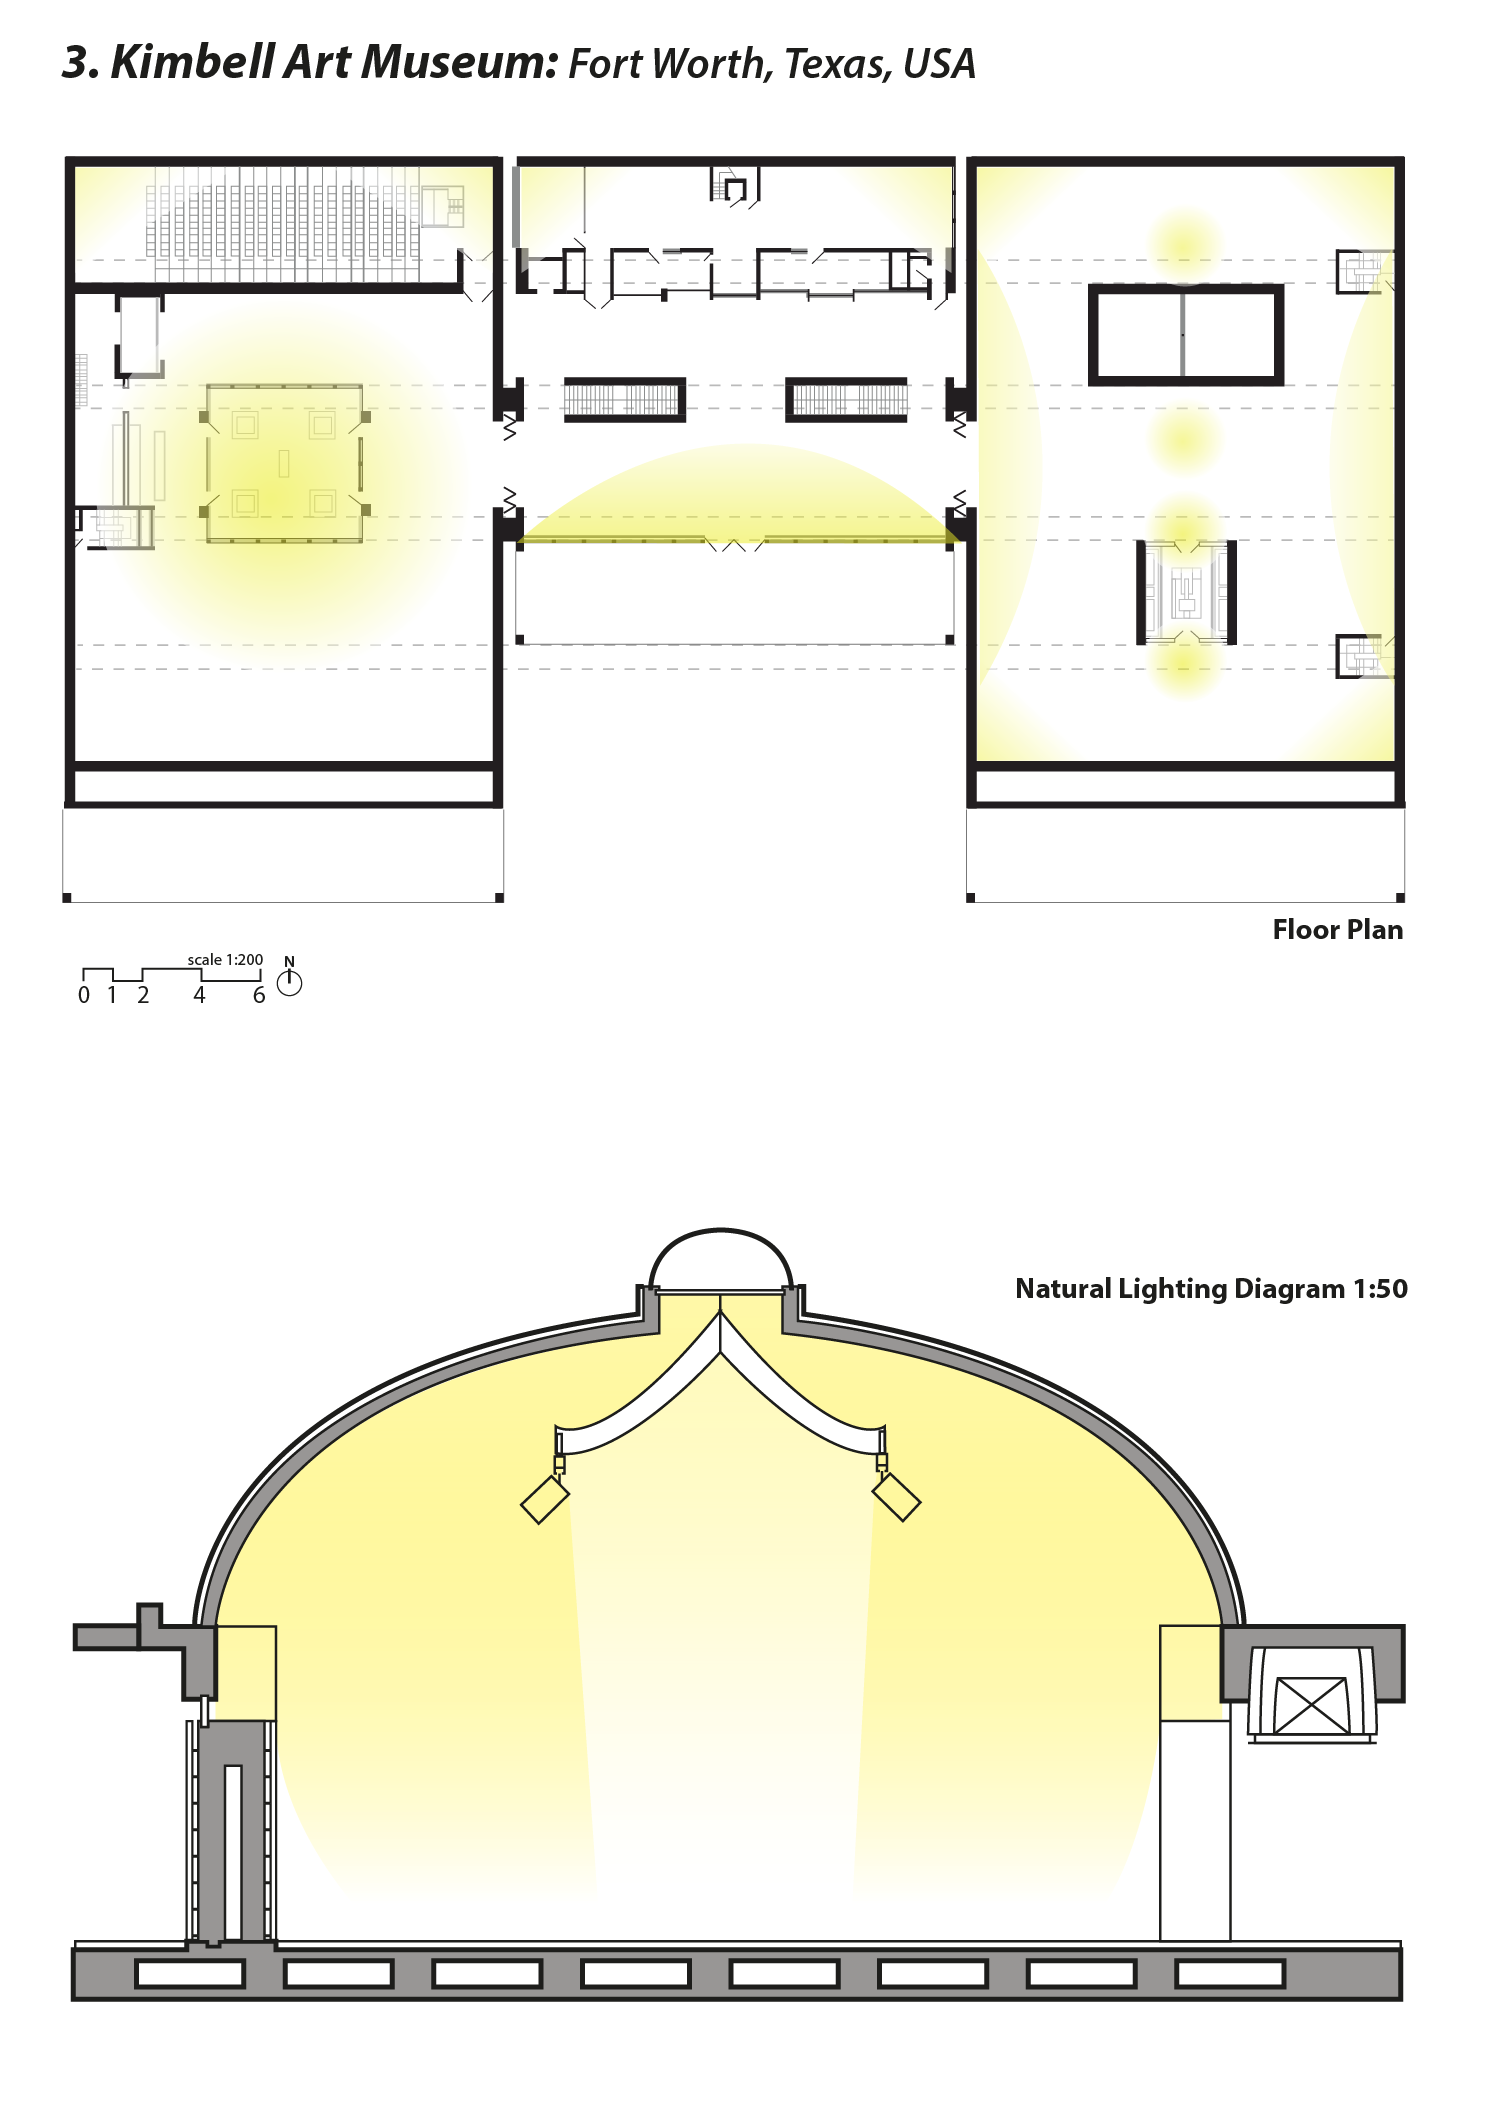 lighting architecture diagram 1985 winnebago chieftain wiring natural study of the kimbell museum